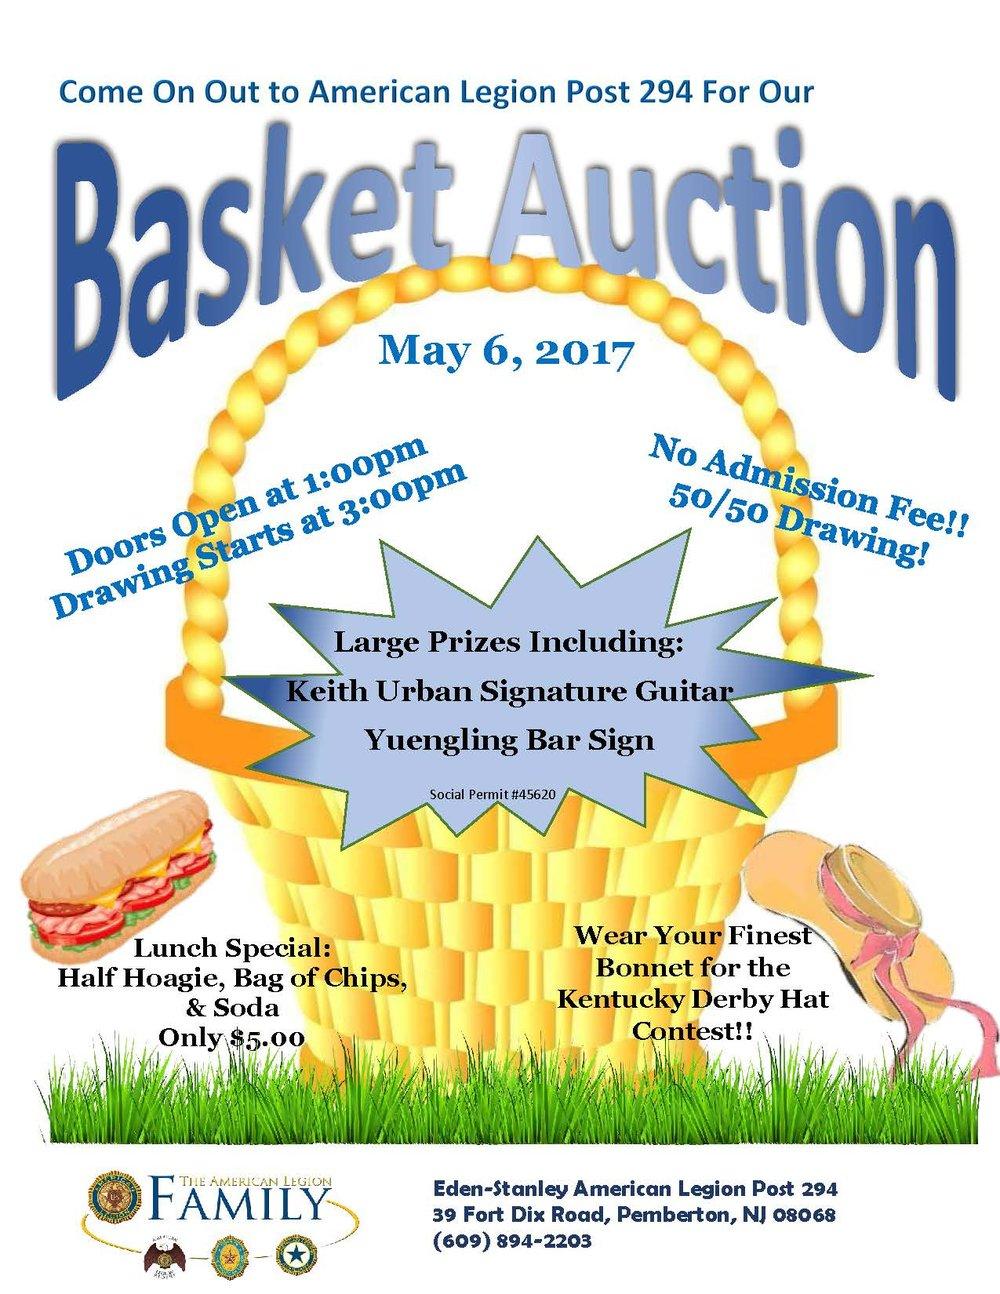 Basket Auction - Amer Leg